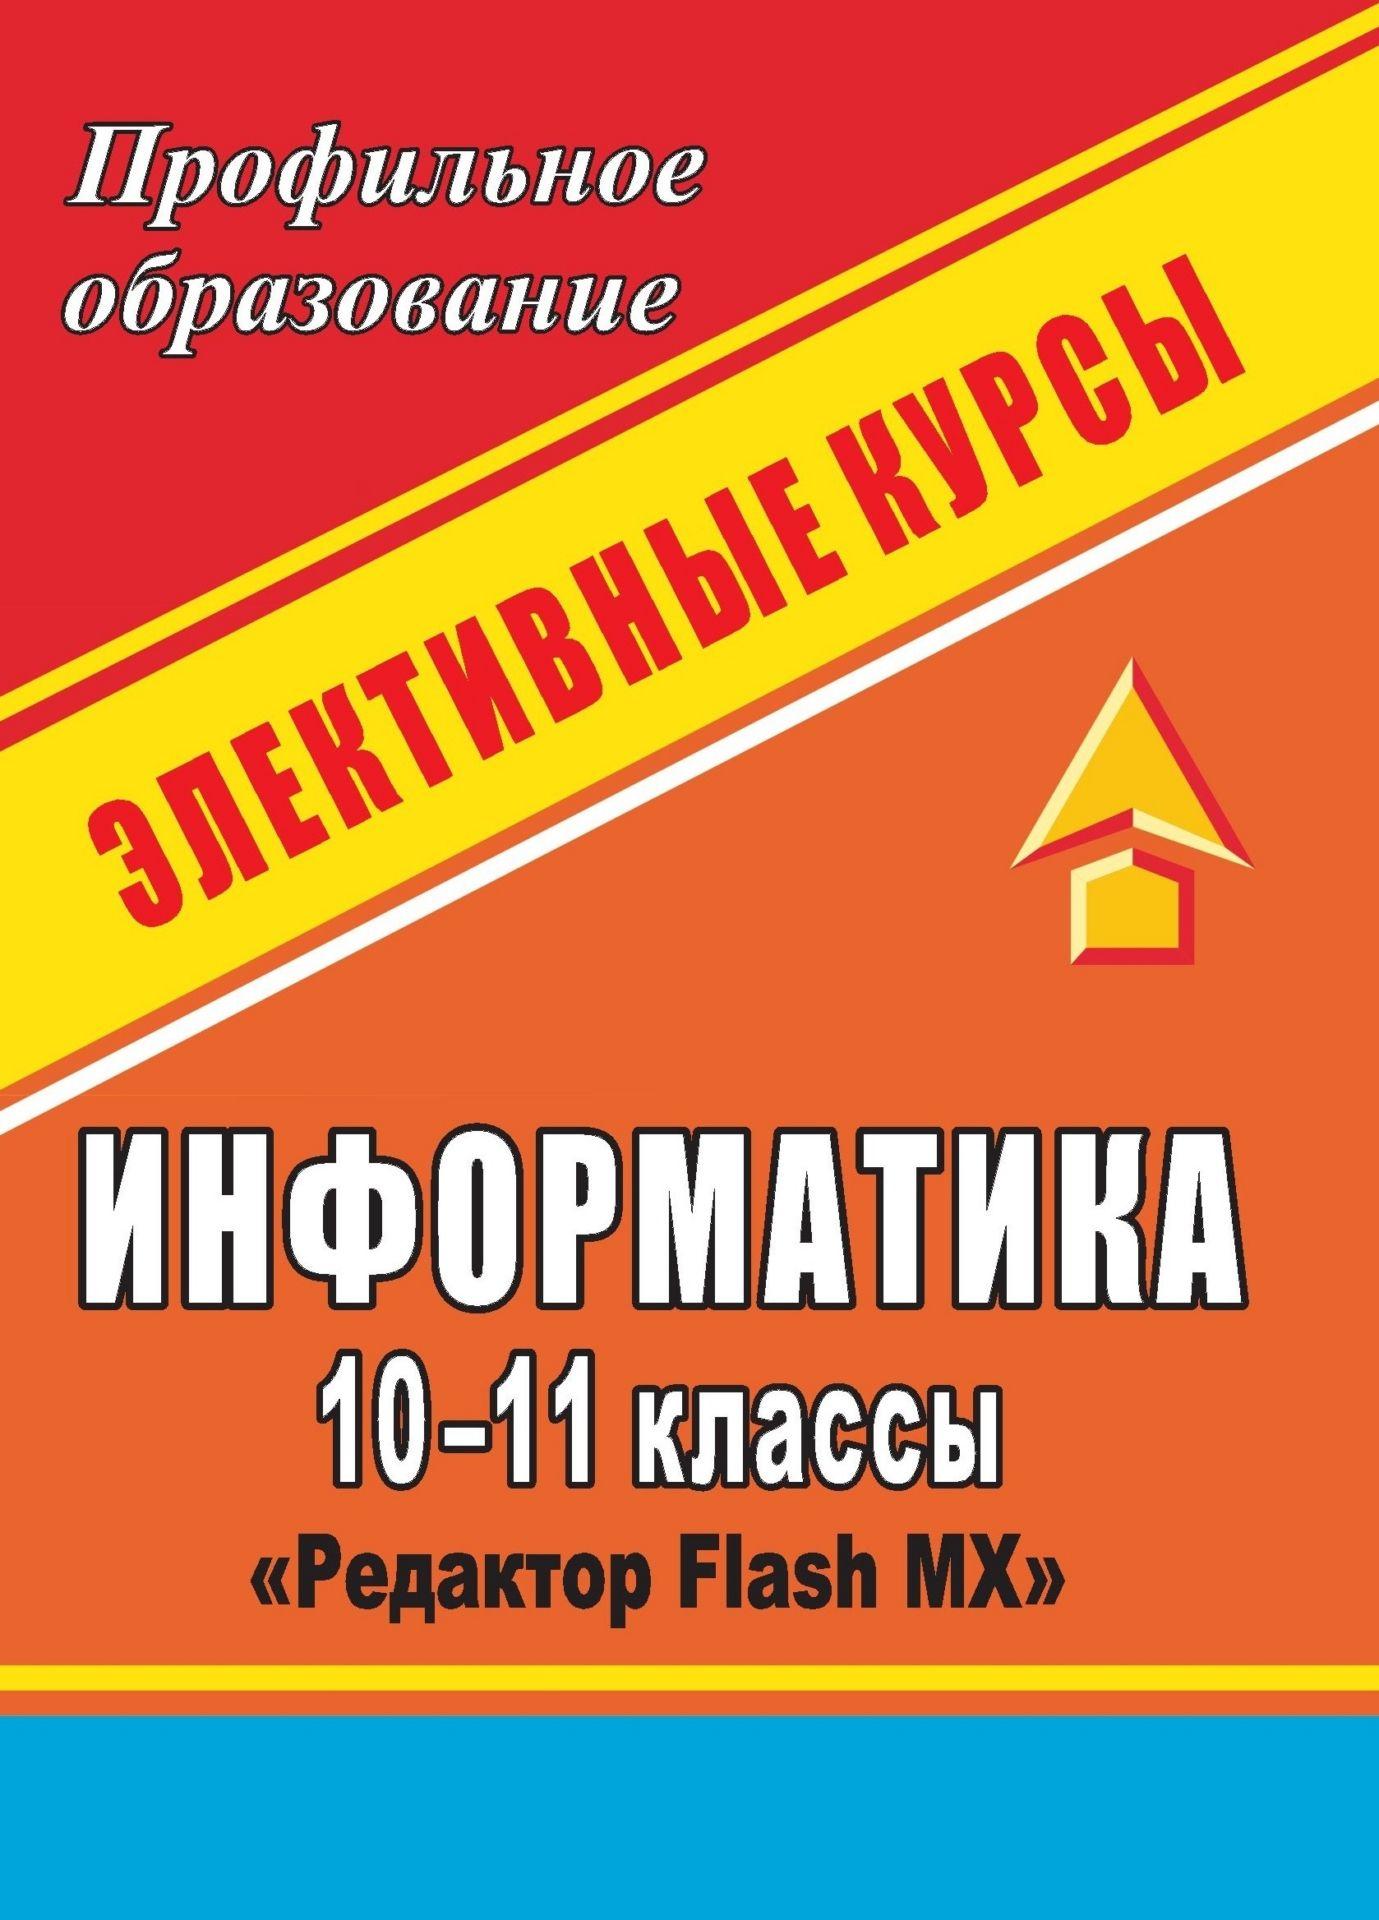 "Информатика. 10-11 классы: элективный курс ""Редактор Flash MX"""